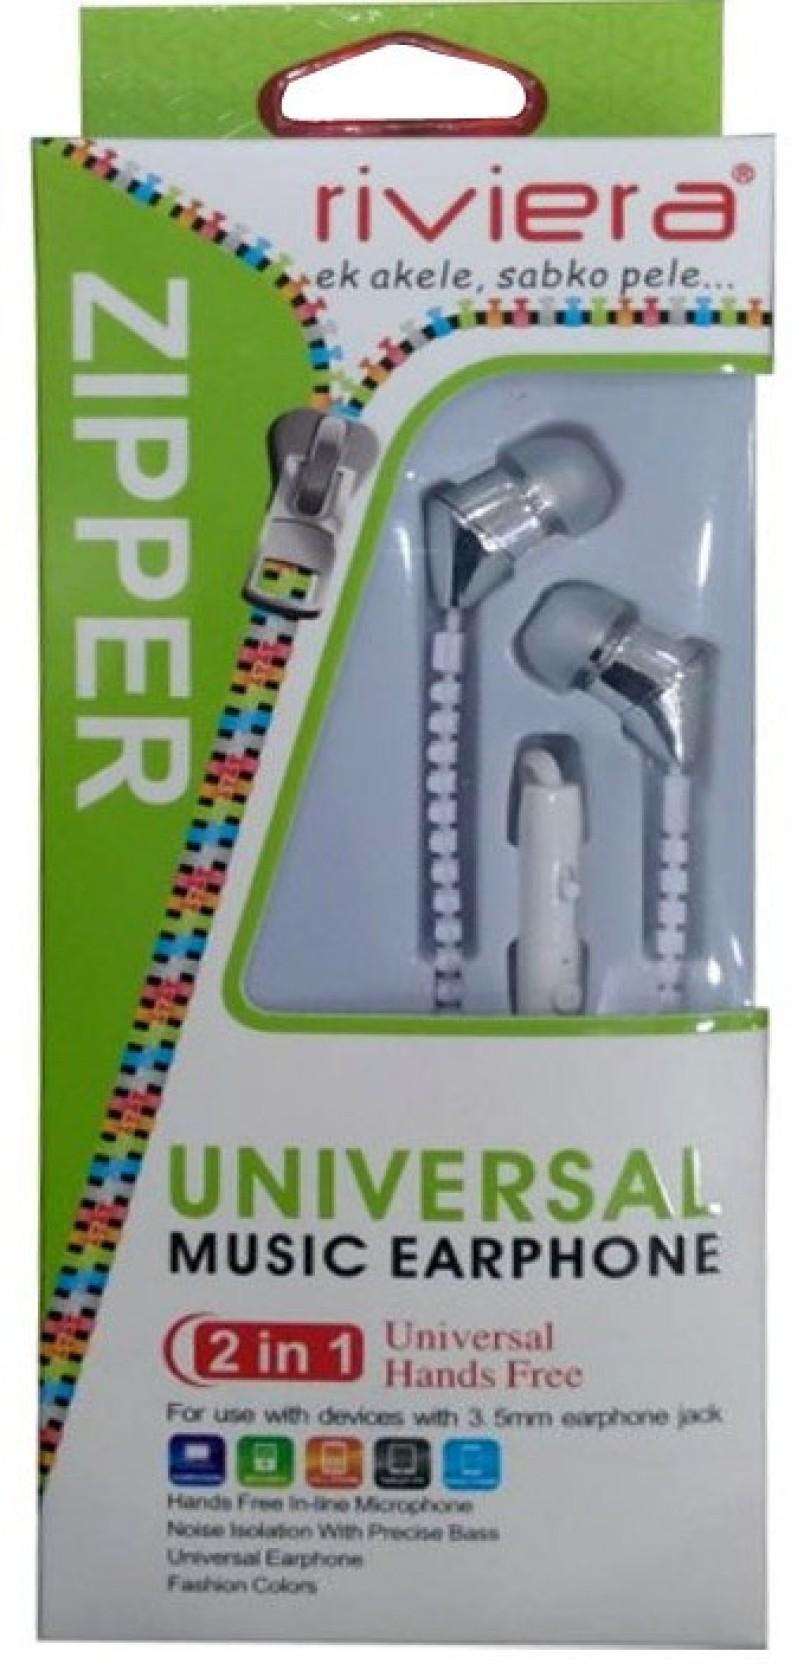 Riviera 2 In 1 Universal Music Earphone Headphone Price India Hf Zipper Home